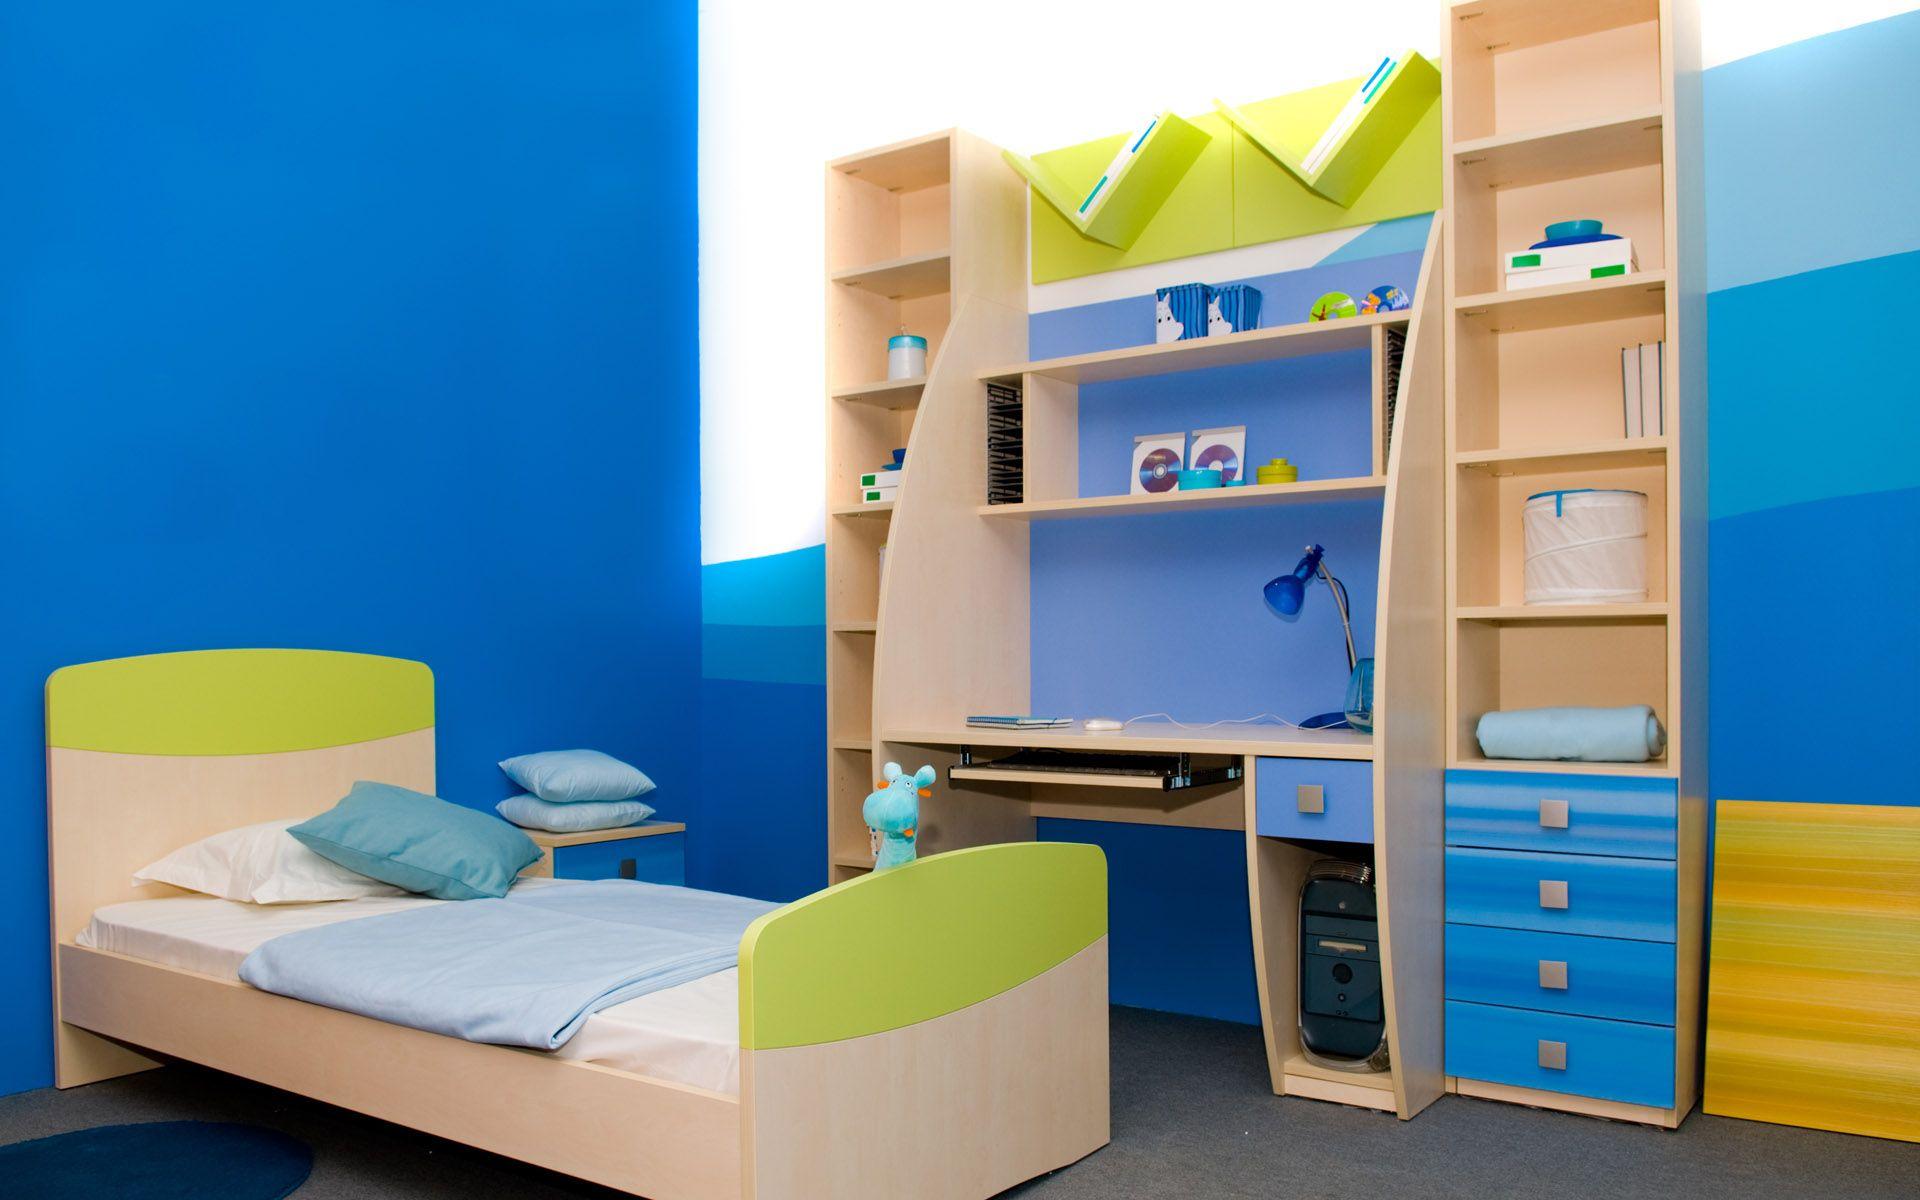 Bedrooms flooring for kids rooms interior